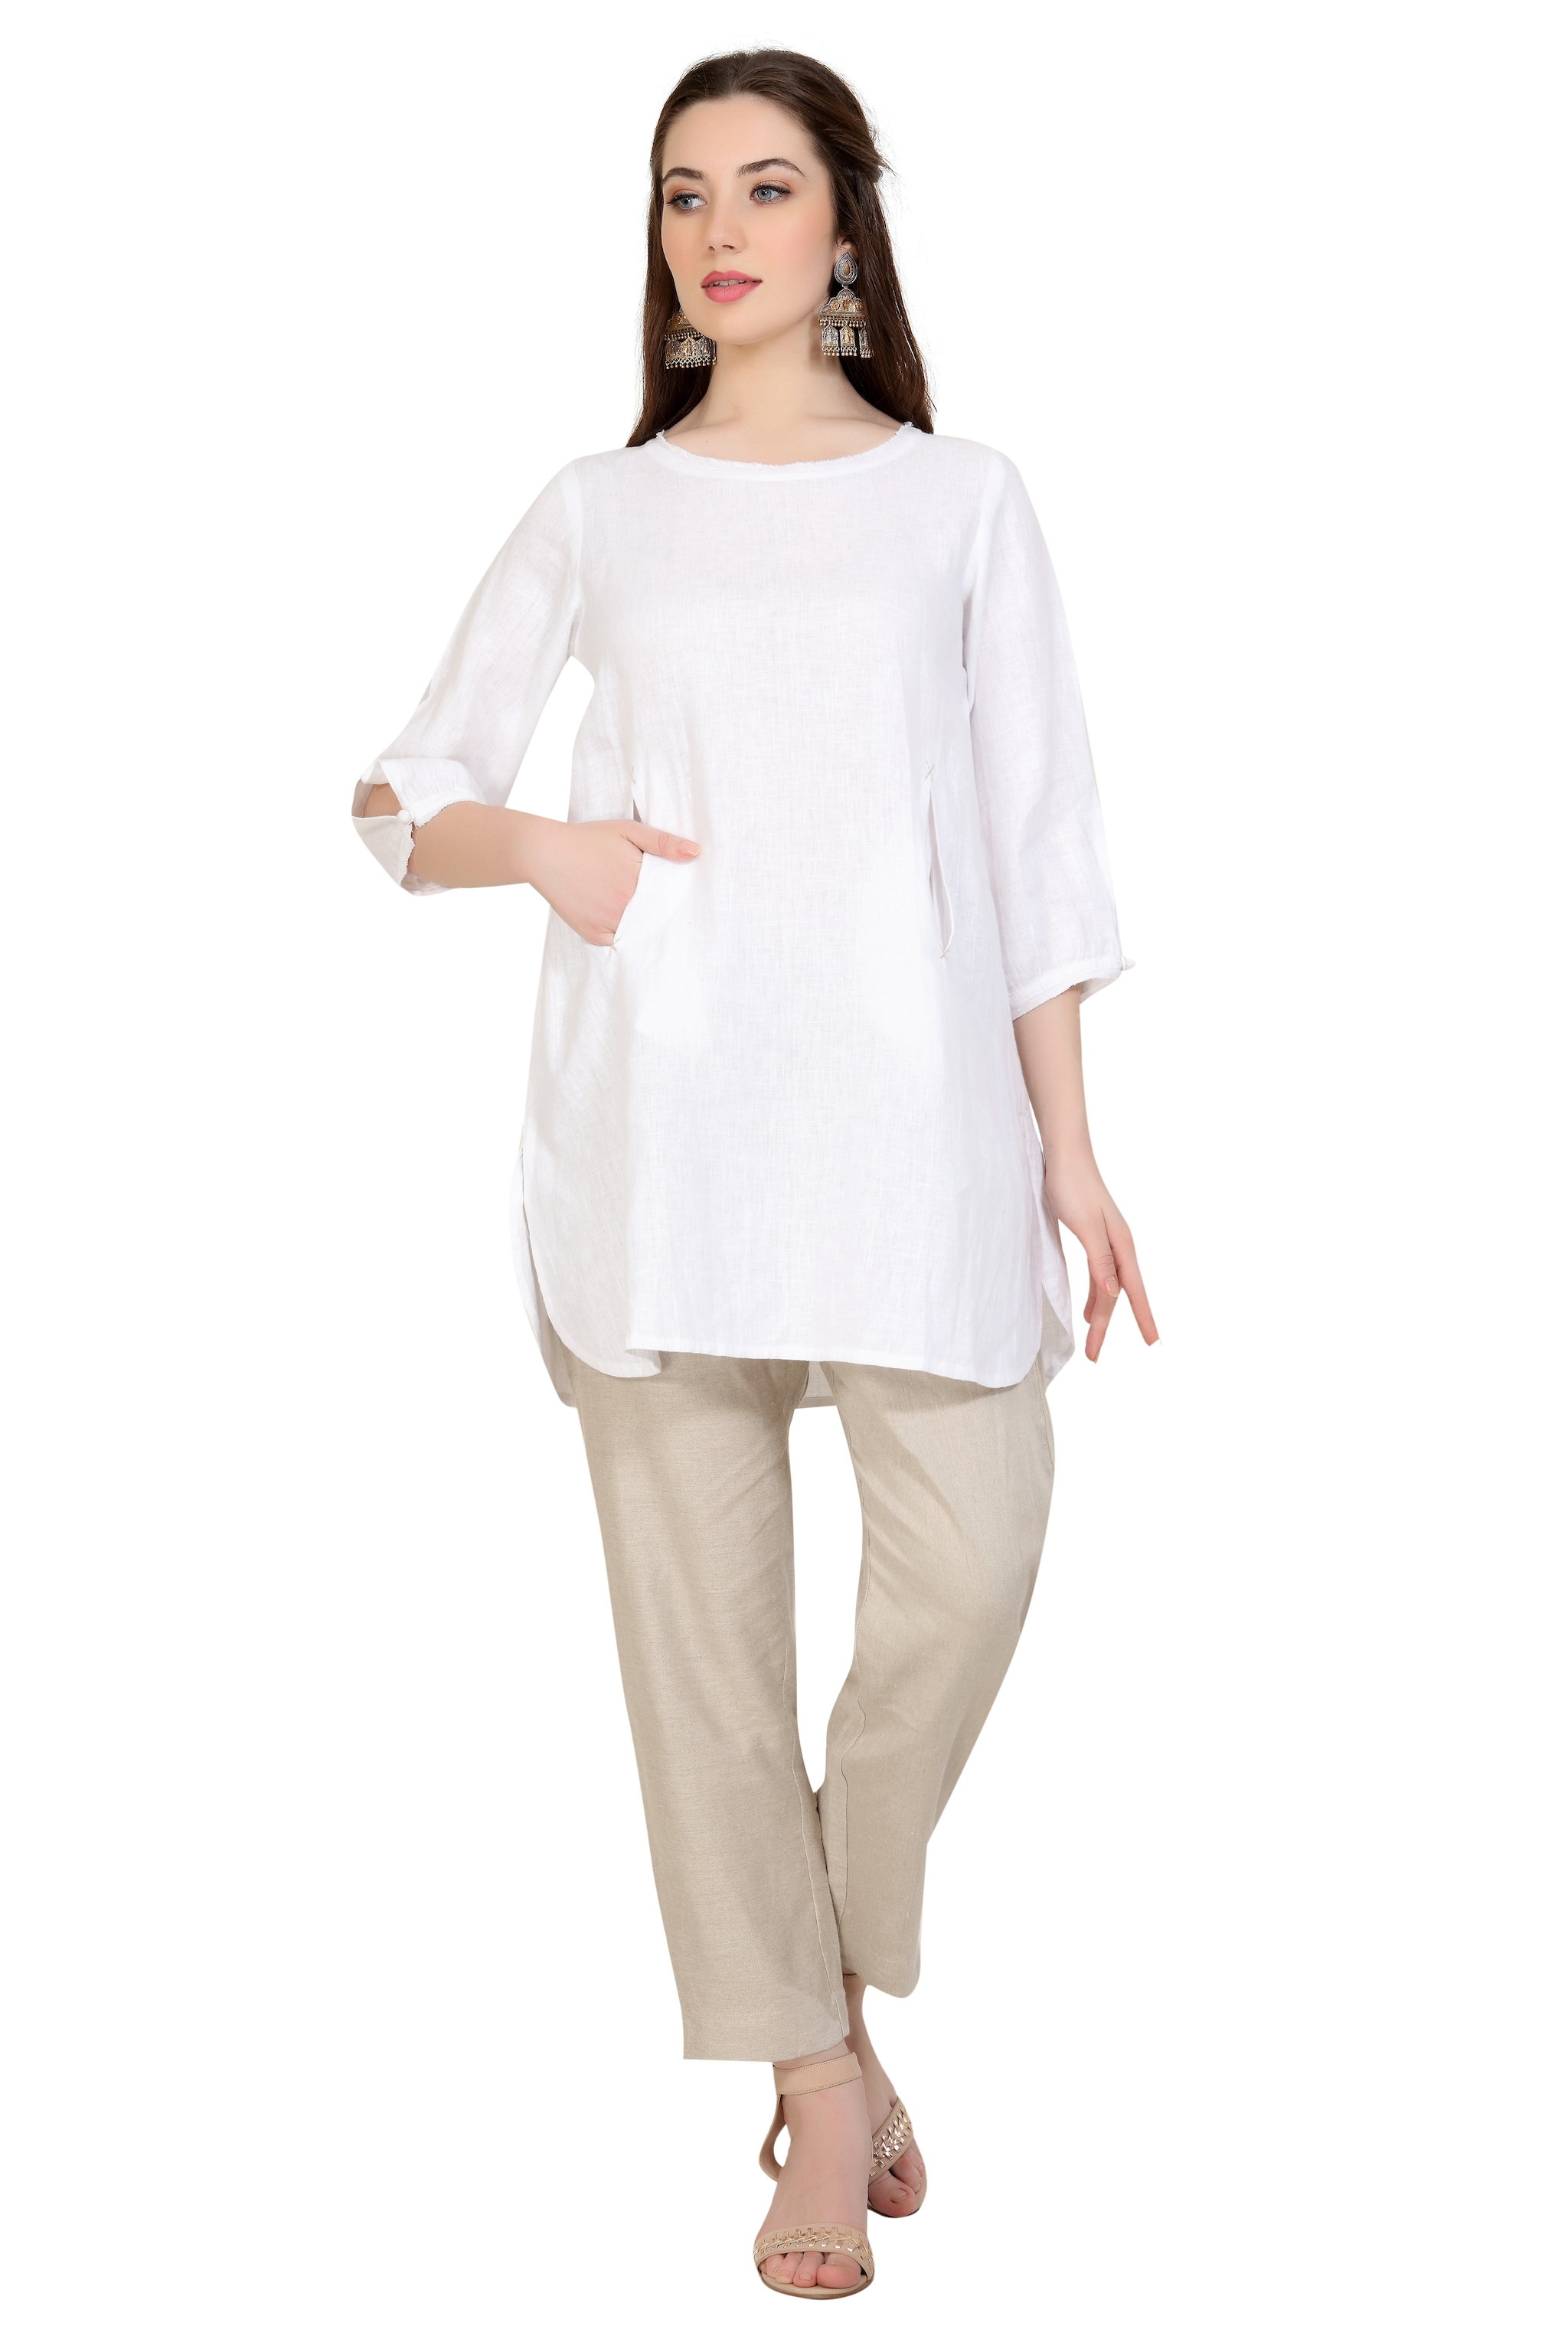 190158 Bleach Linen Front Pocket Top XS - White (XS,White)